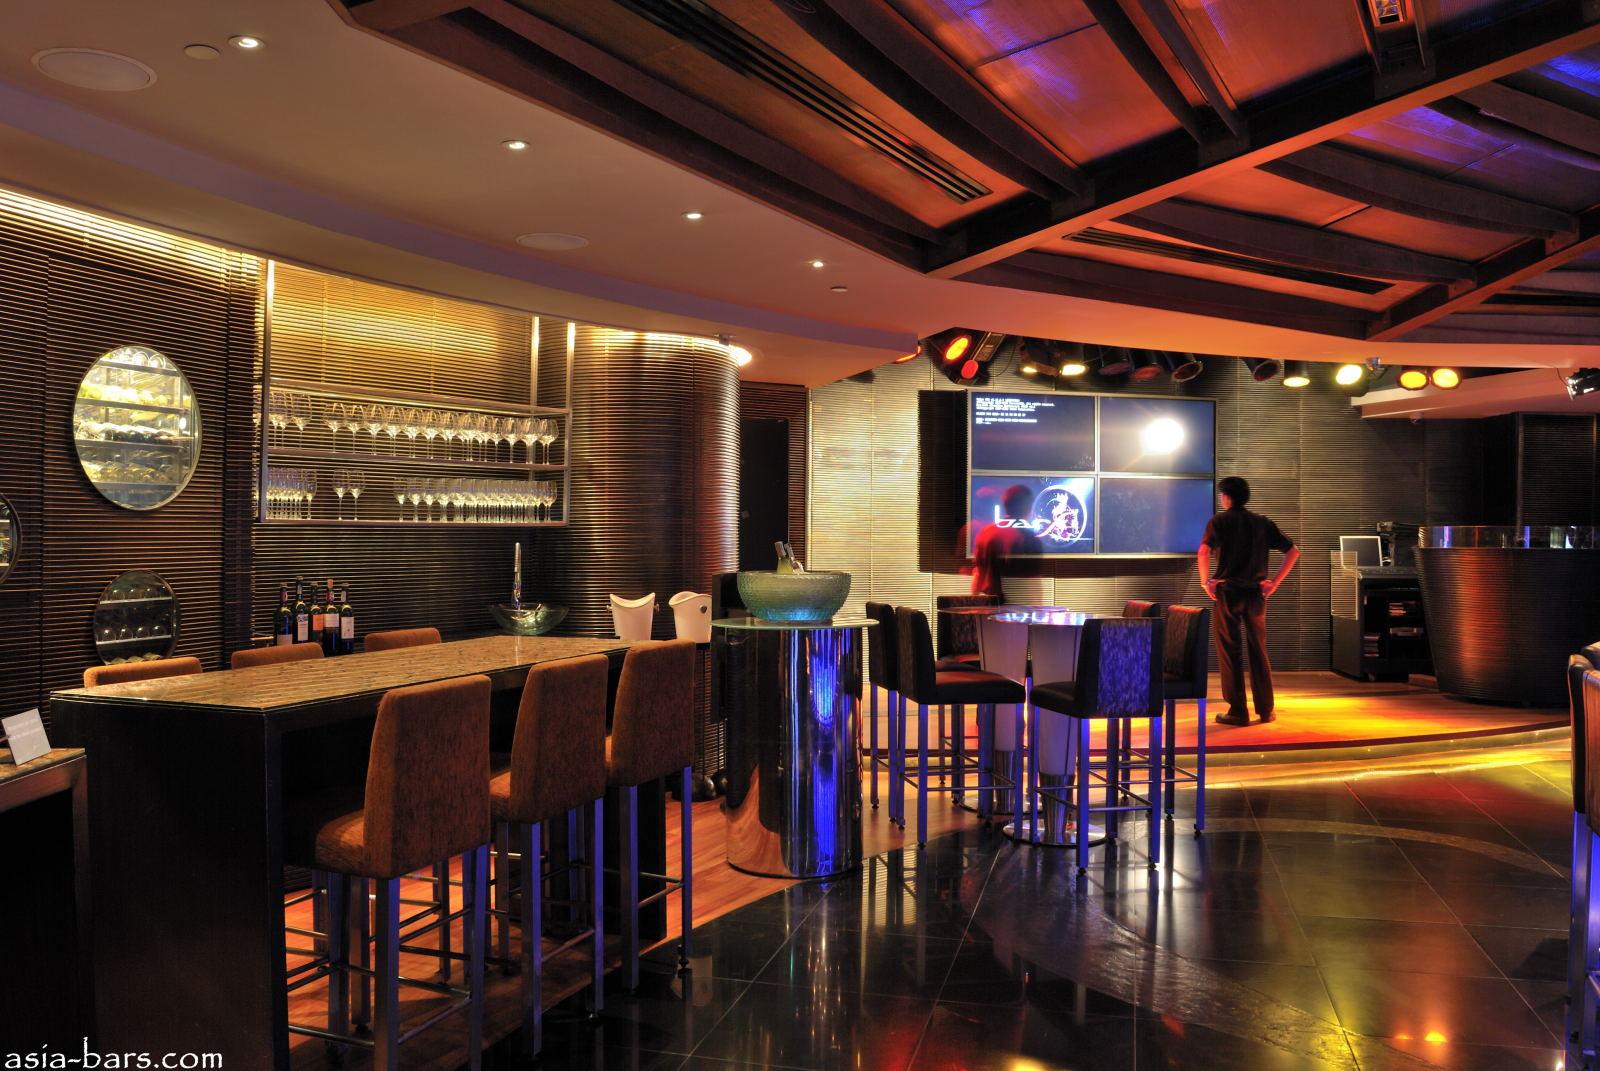 Barsu Elegant Lounge Bar Offers Sophisticated Nightlife